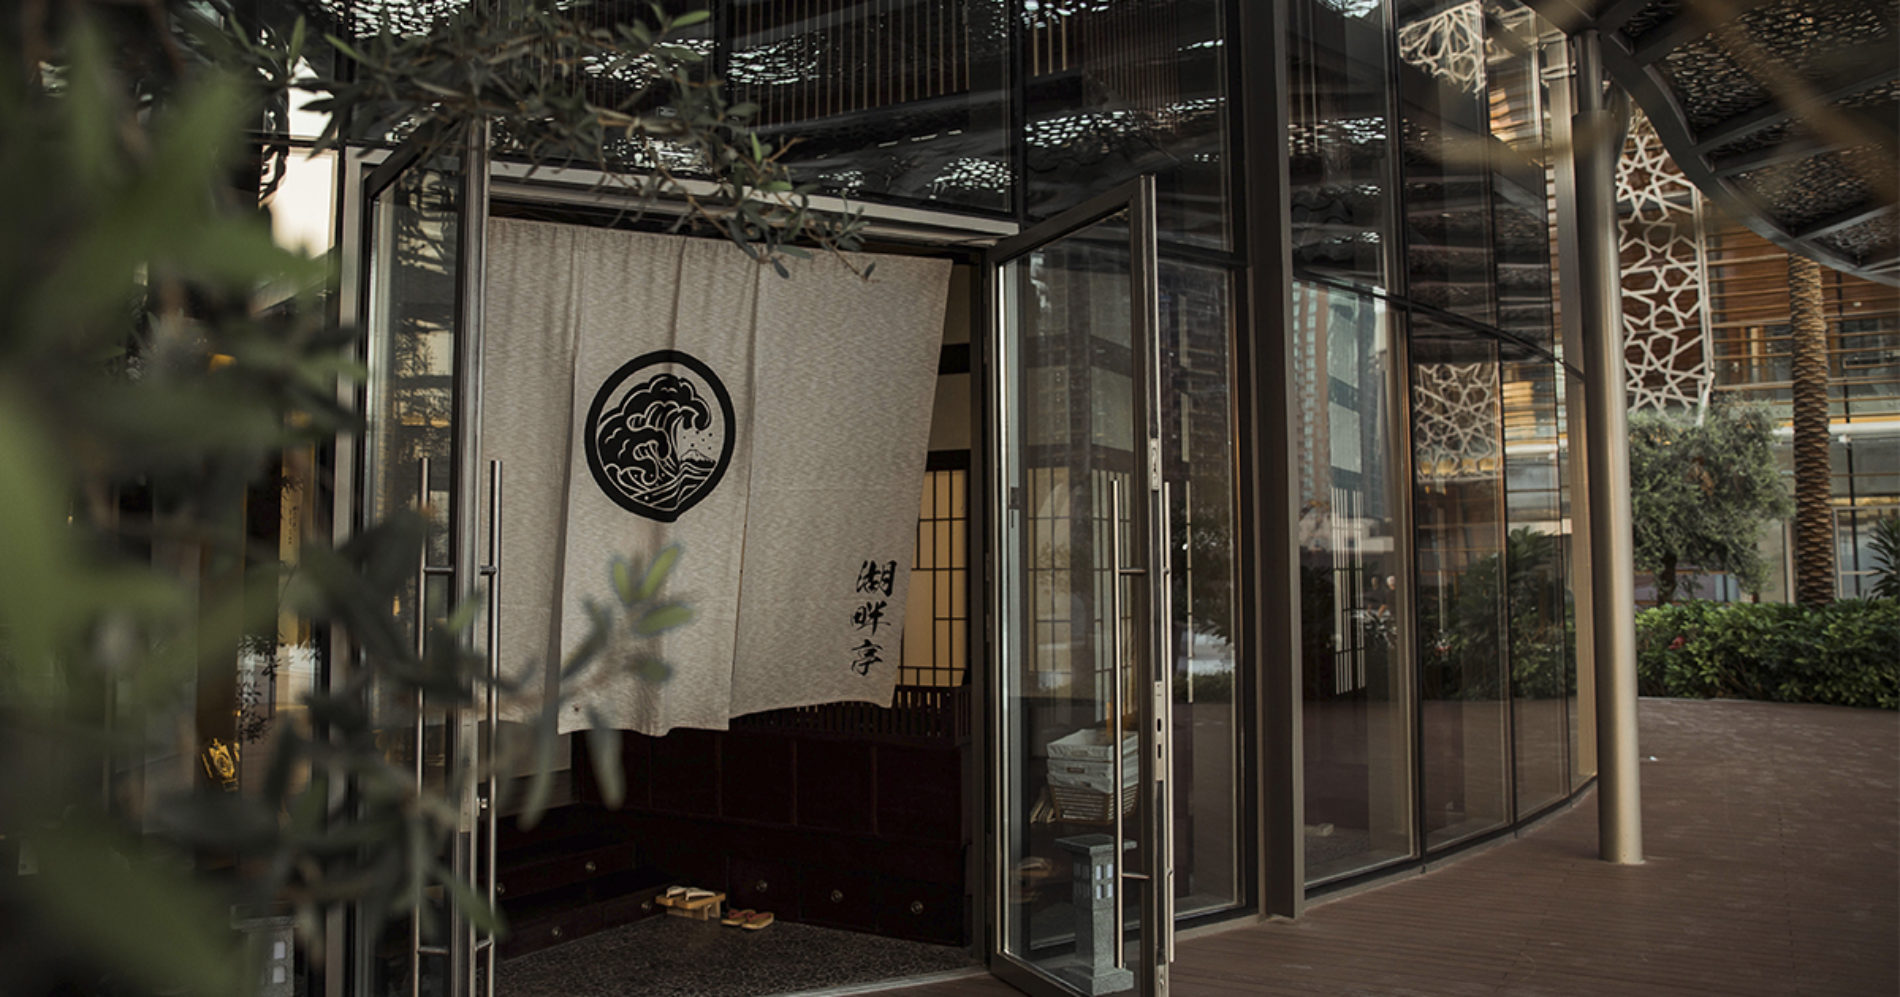 Hisao Ueda: the man behind Dubai's first Japanese beef kaiseki restaurant